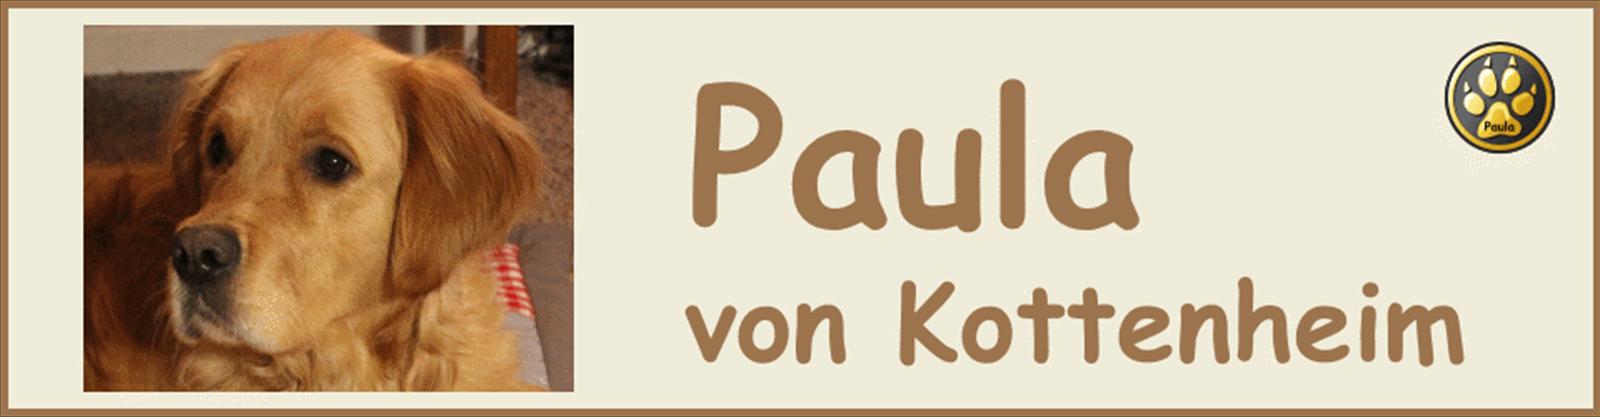 Paula-Banner-06